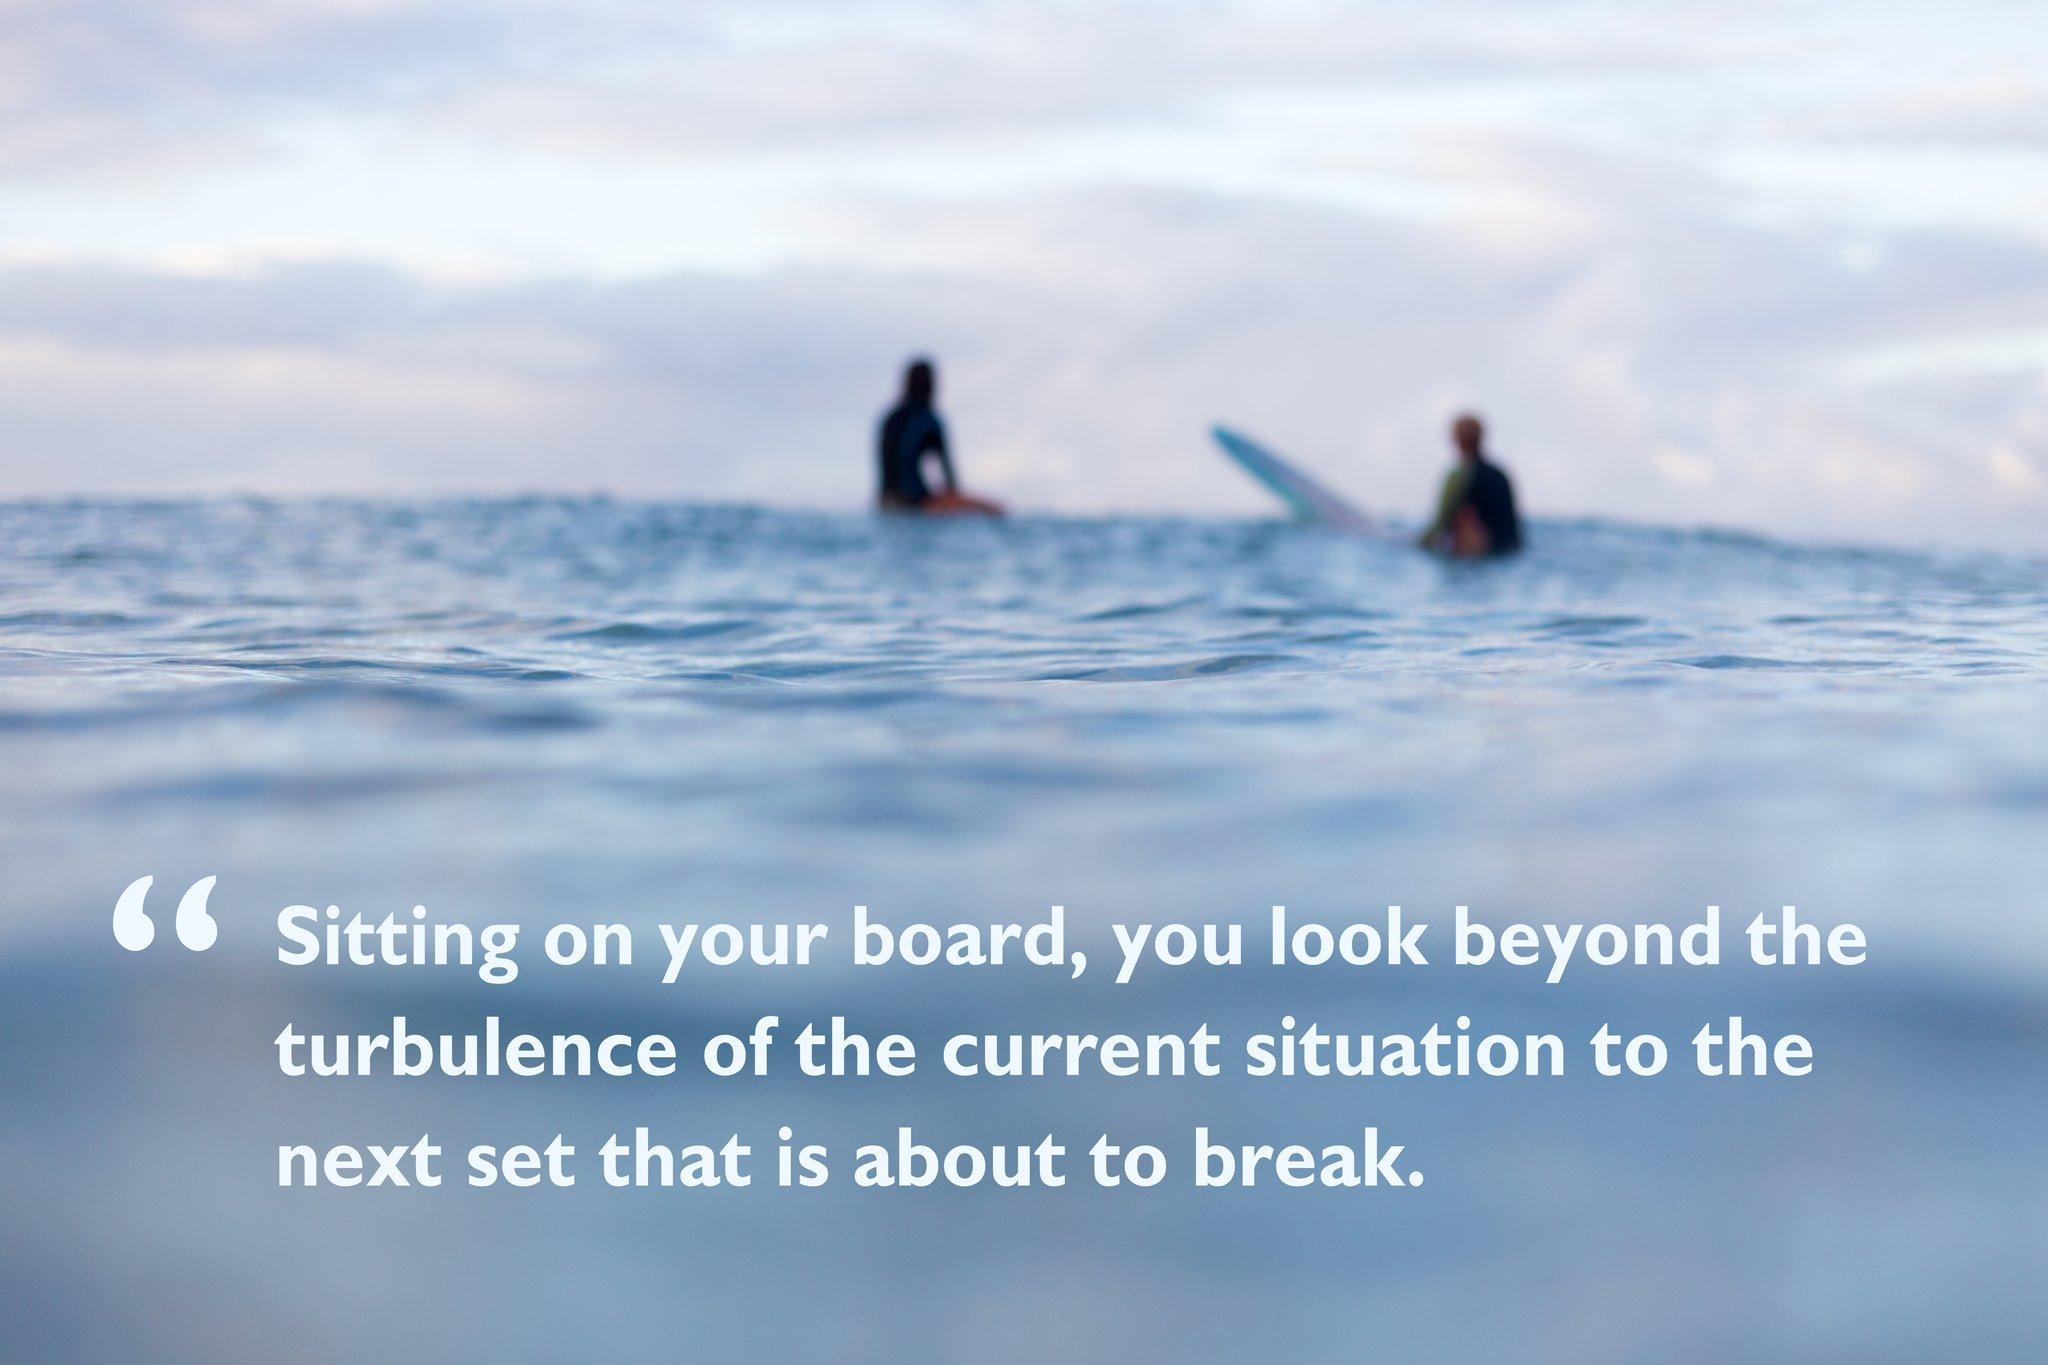 scienceofsurfing